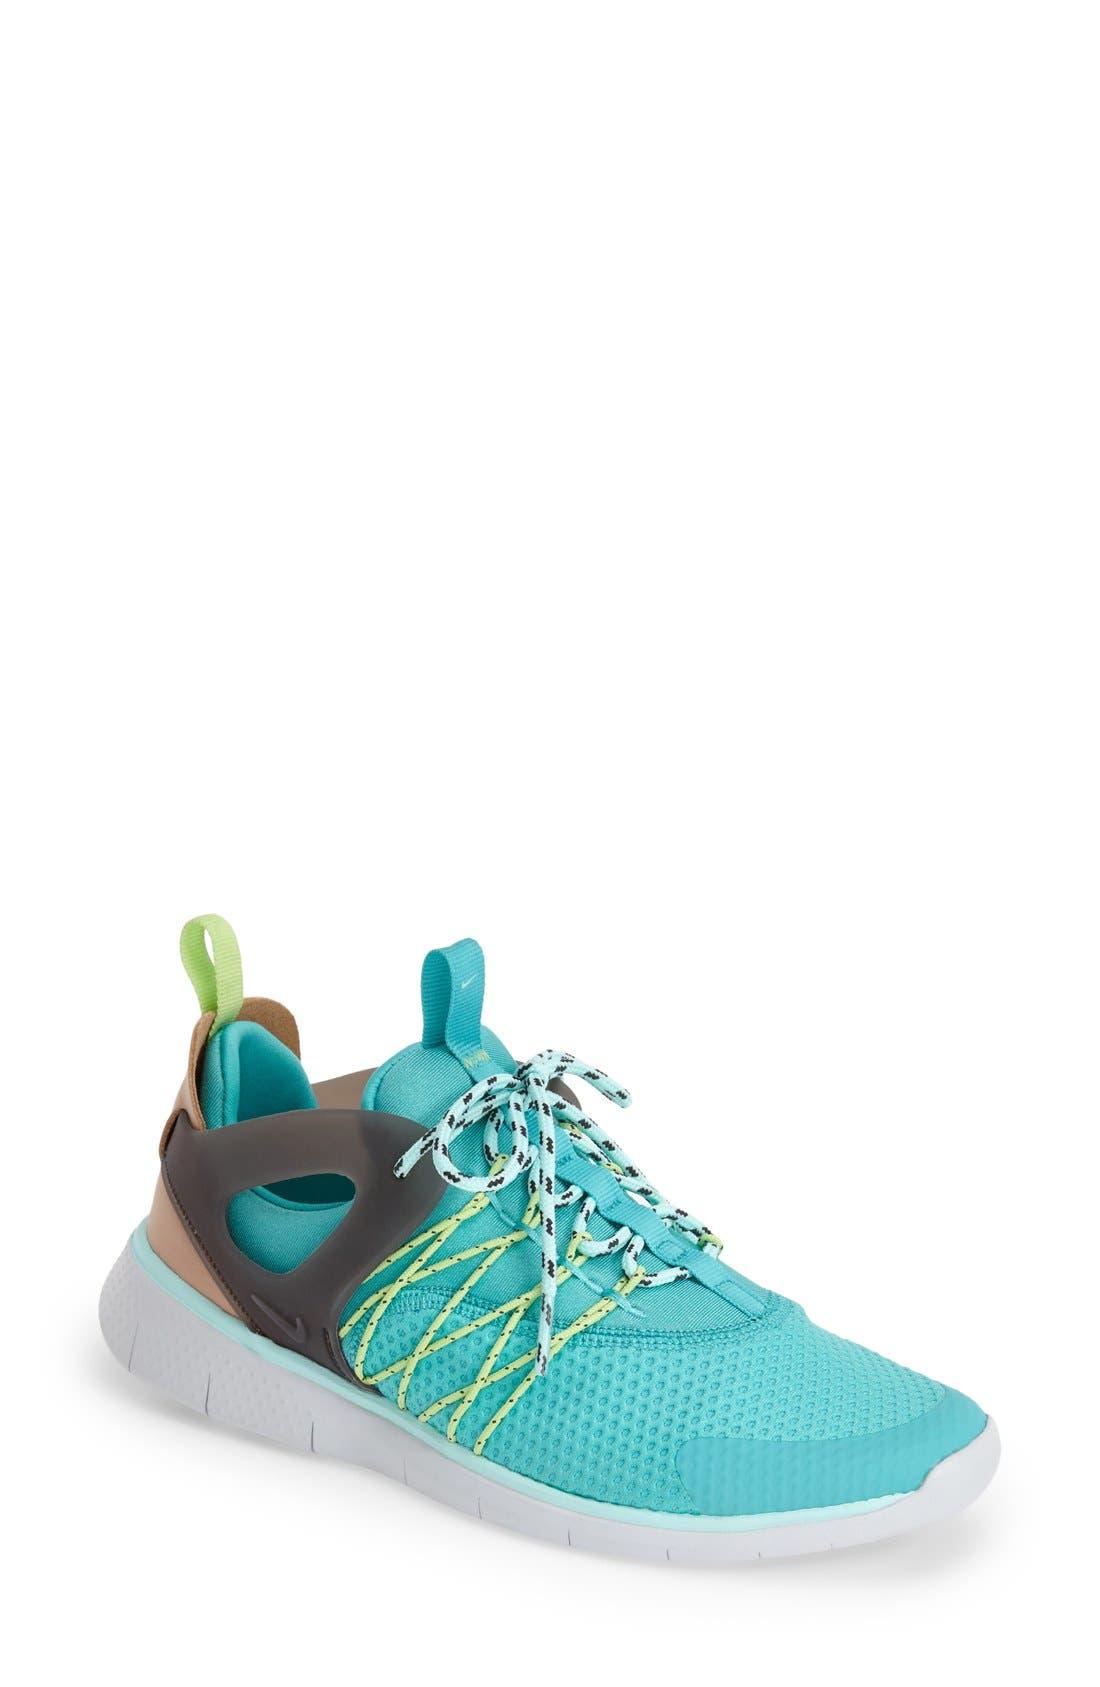 Alternate Image 1 Selected - Nike 'Free 3.0 Virtus' Sneaker (Women)